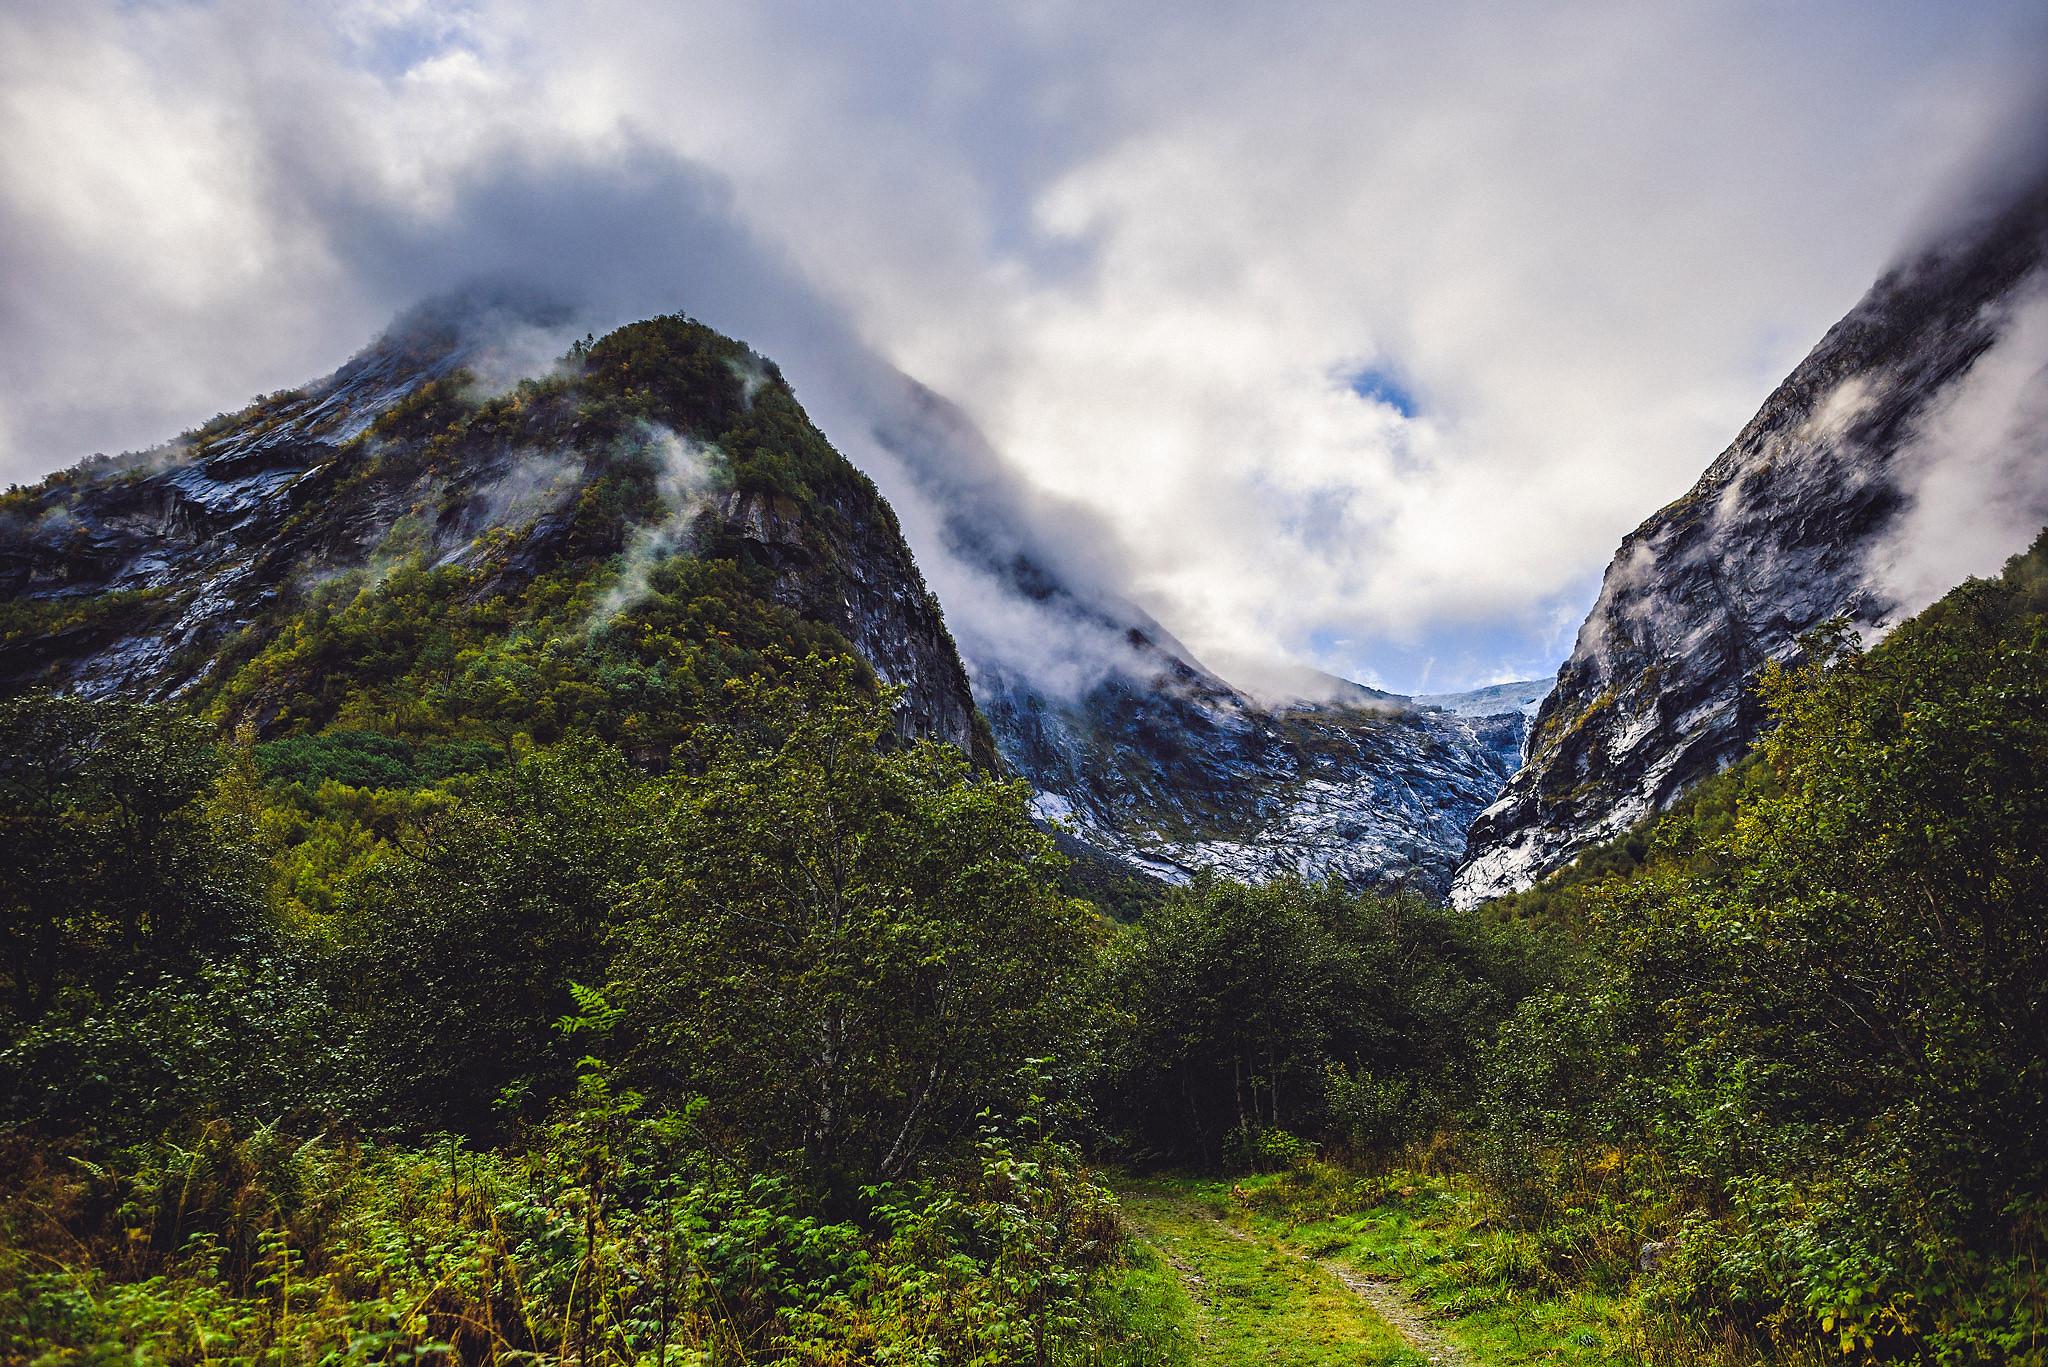 Bryllup på Yrineset i Oldedalen bryllupsfotograf sogn og fjordane-51.jpg